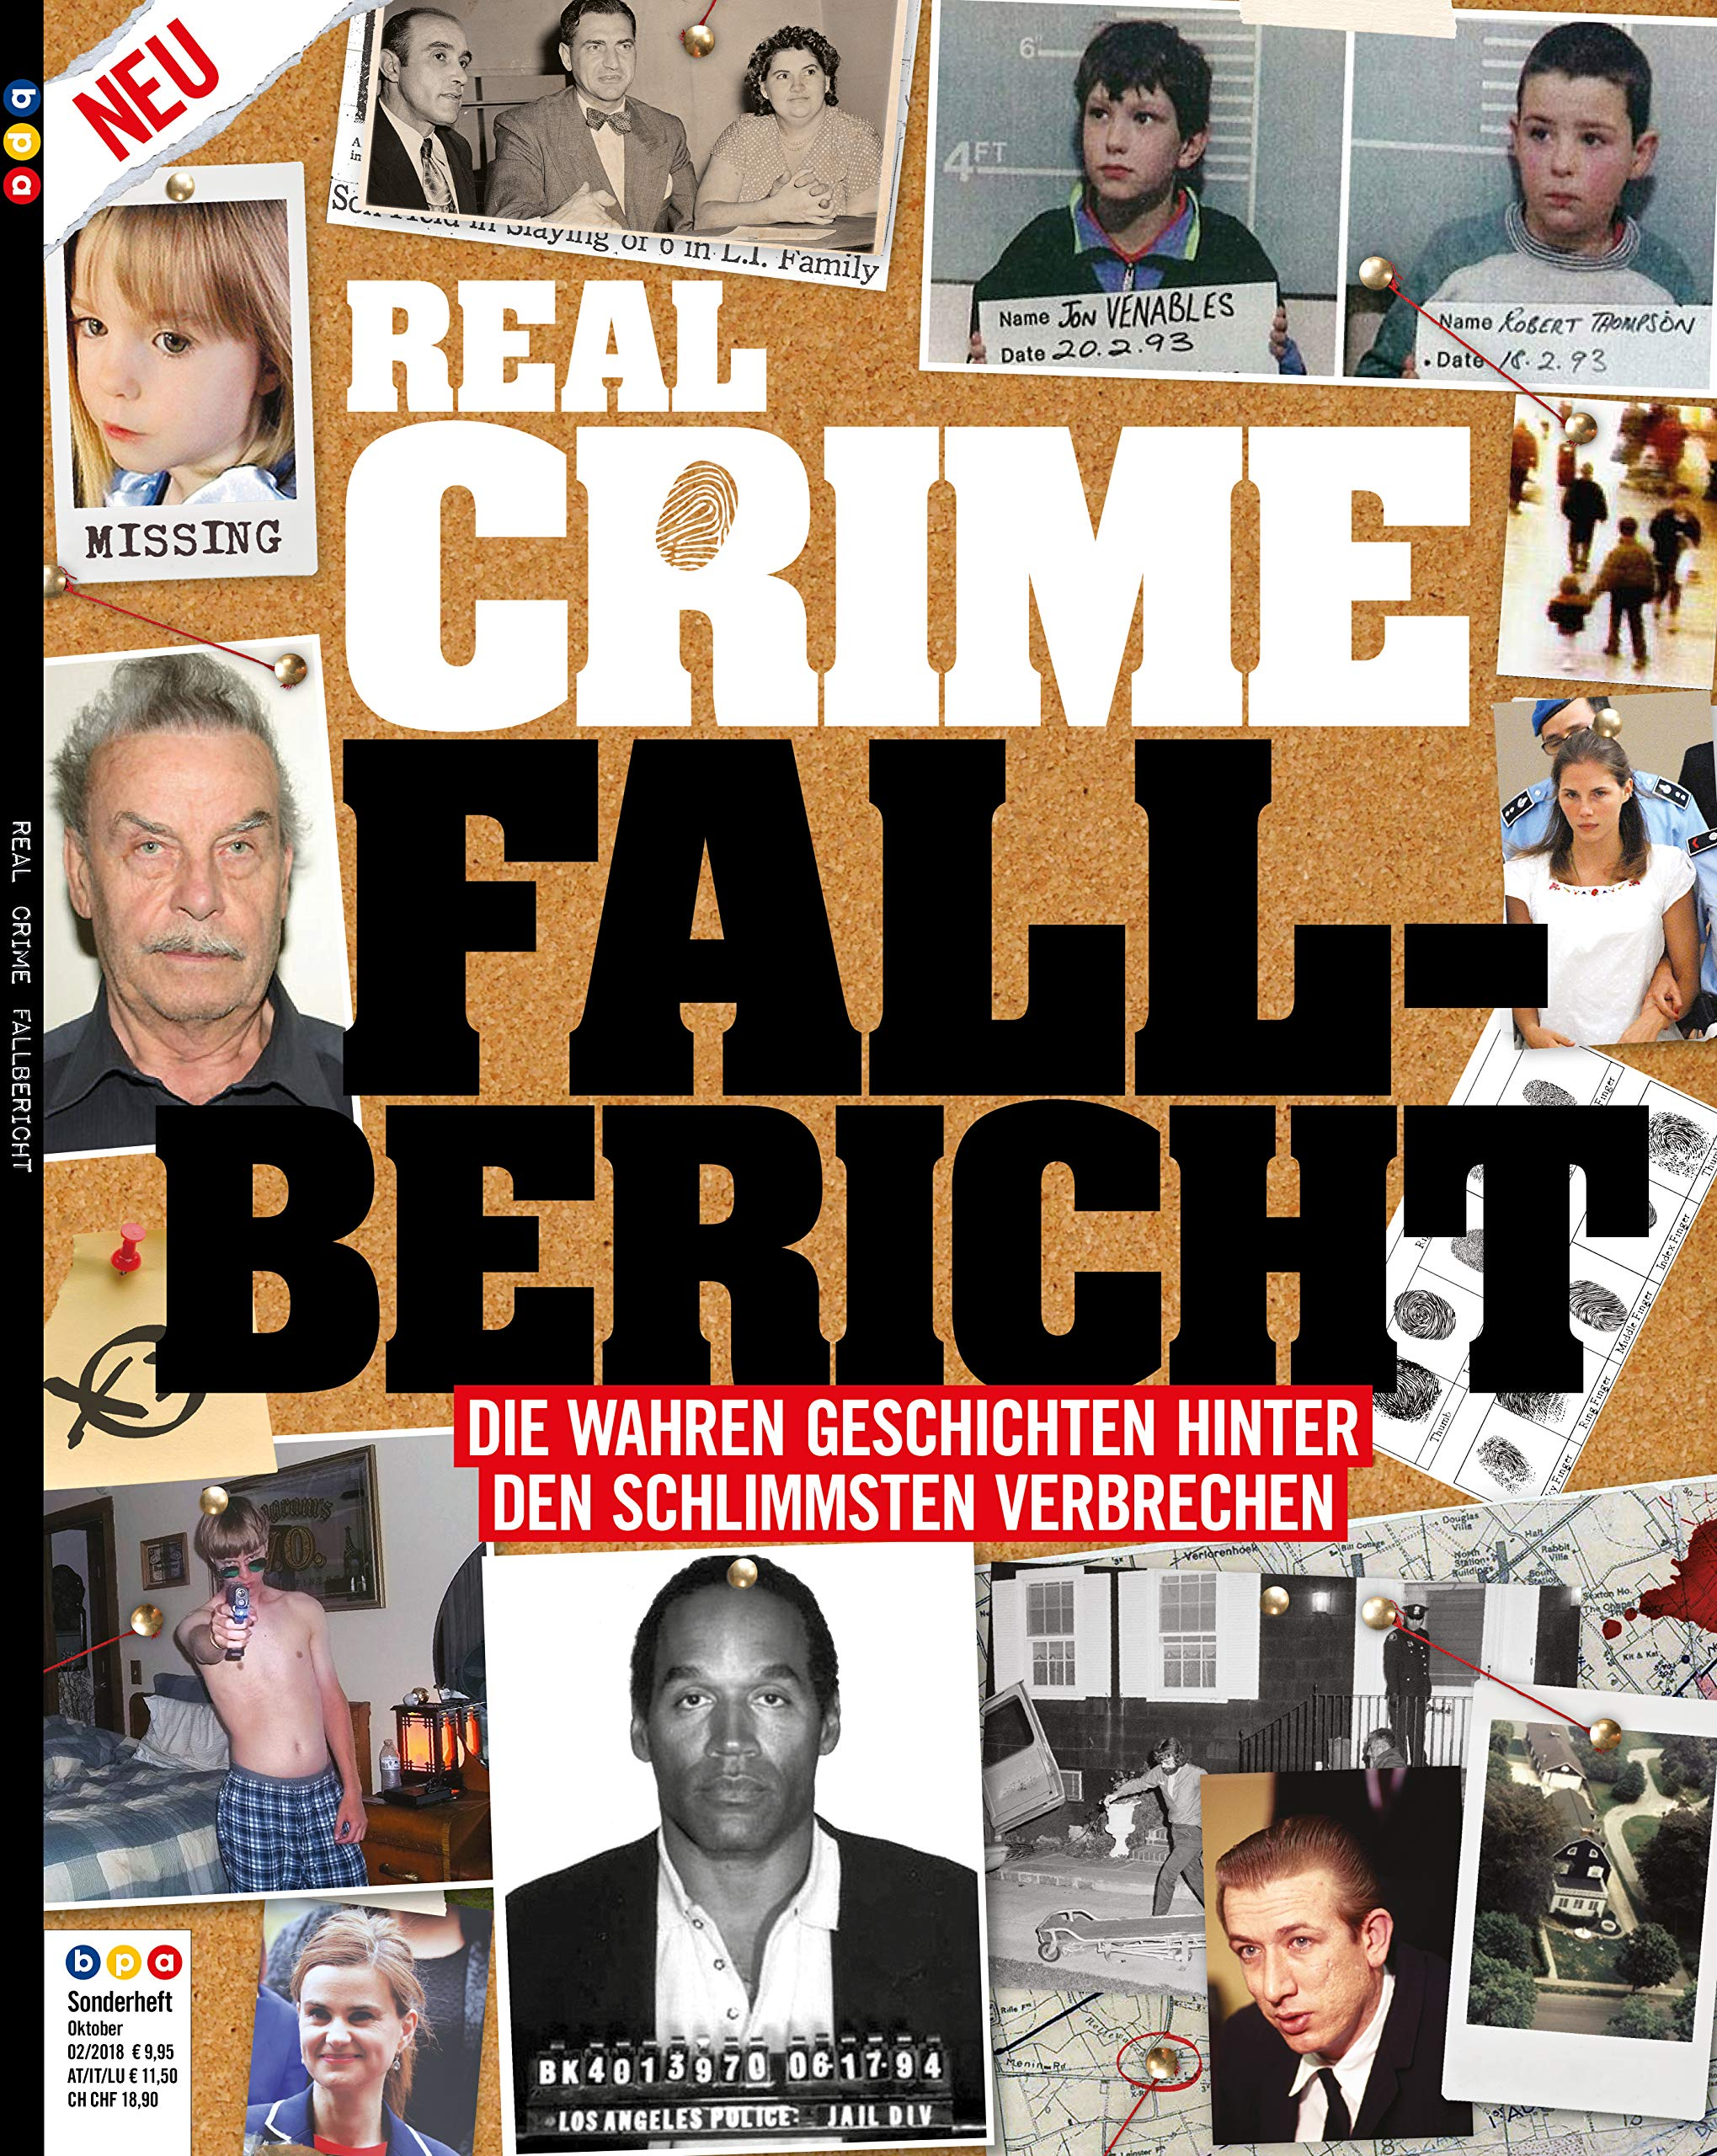 Real Crime - Sonderheft: Fall-Bericht - Die wahren Geschichten hinter den schlimmsten Verbrechen Taschenbuch – 12. Oktober 2018 Oliver Buss bpa media GmbH (Nova MD) B07HSKPHNH True Crime